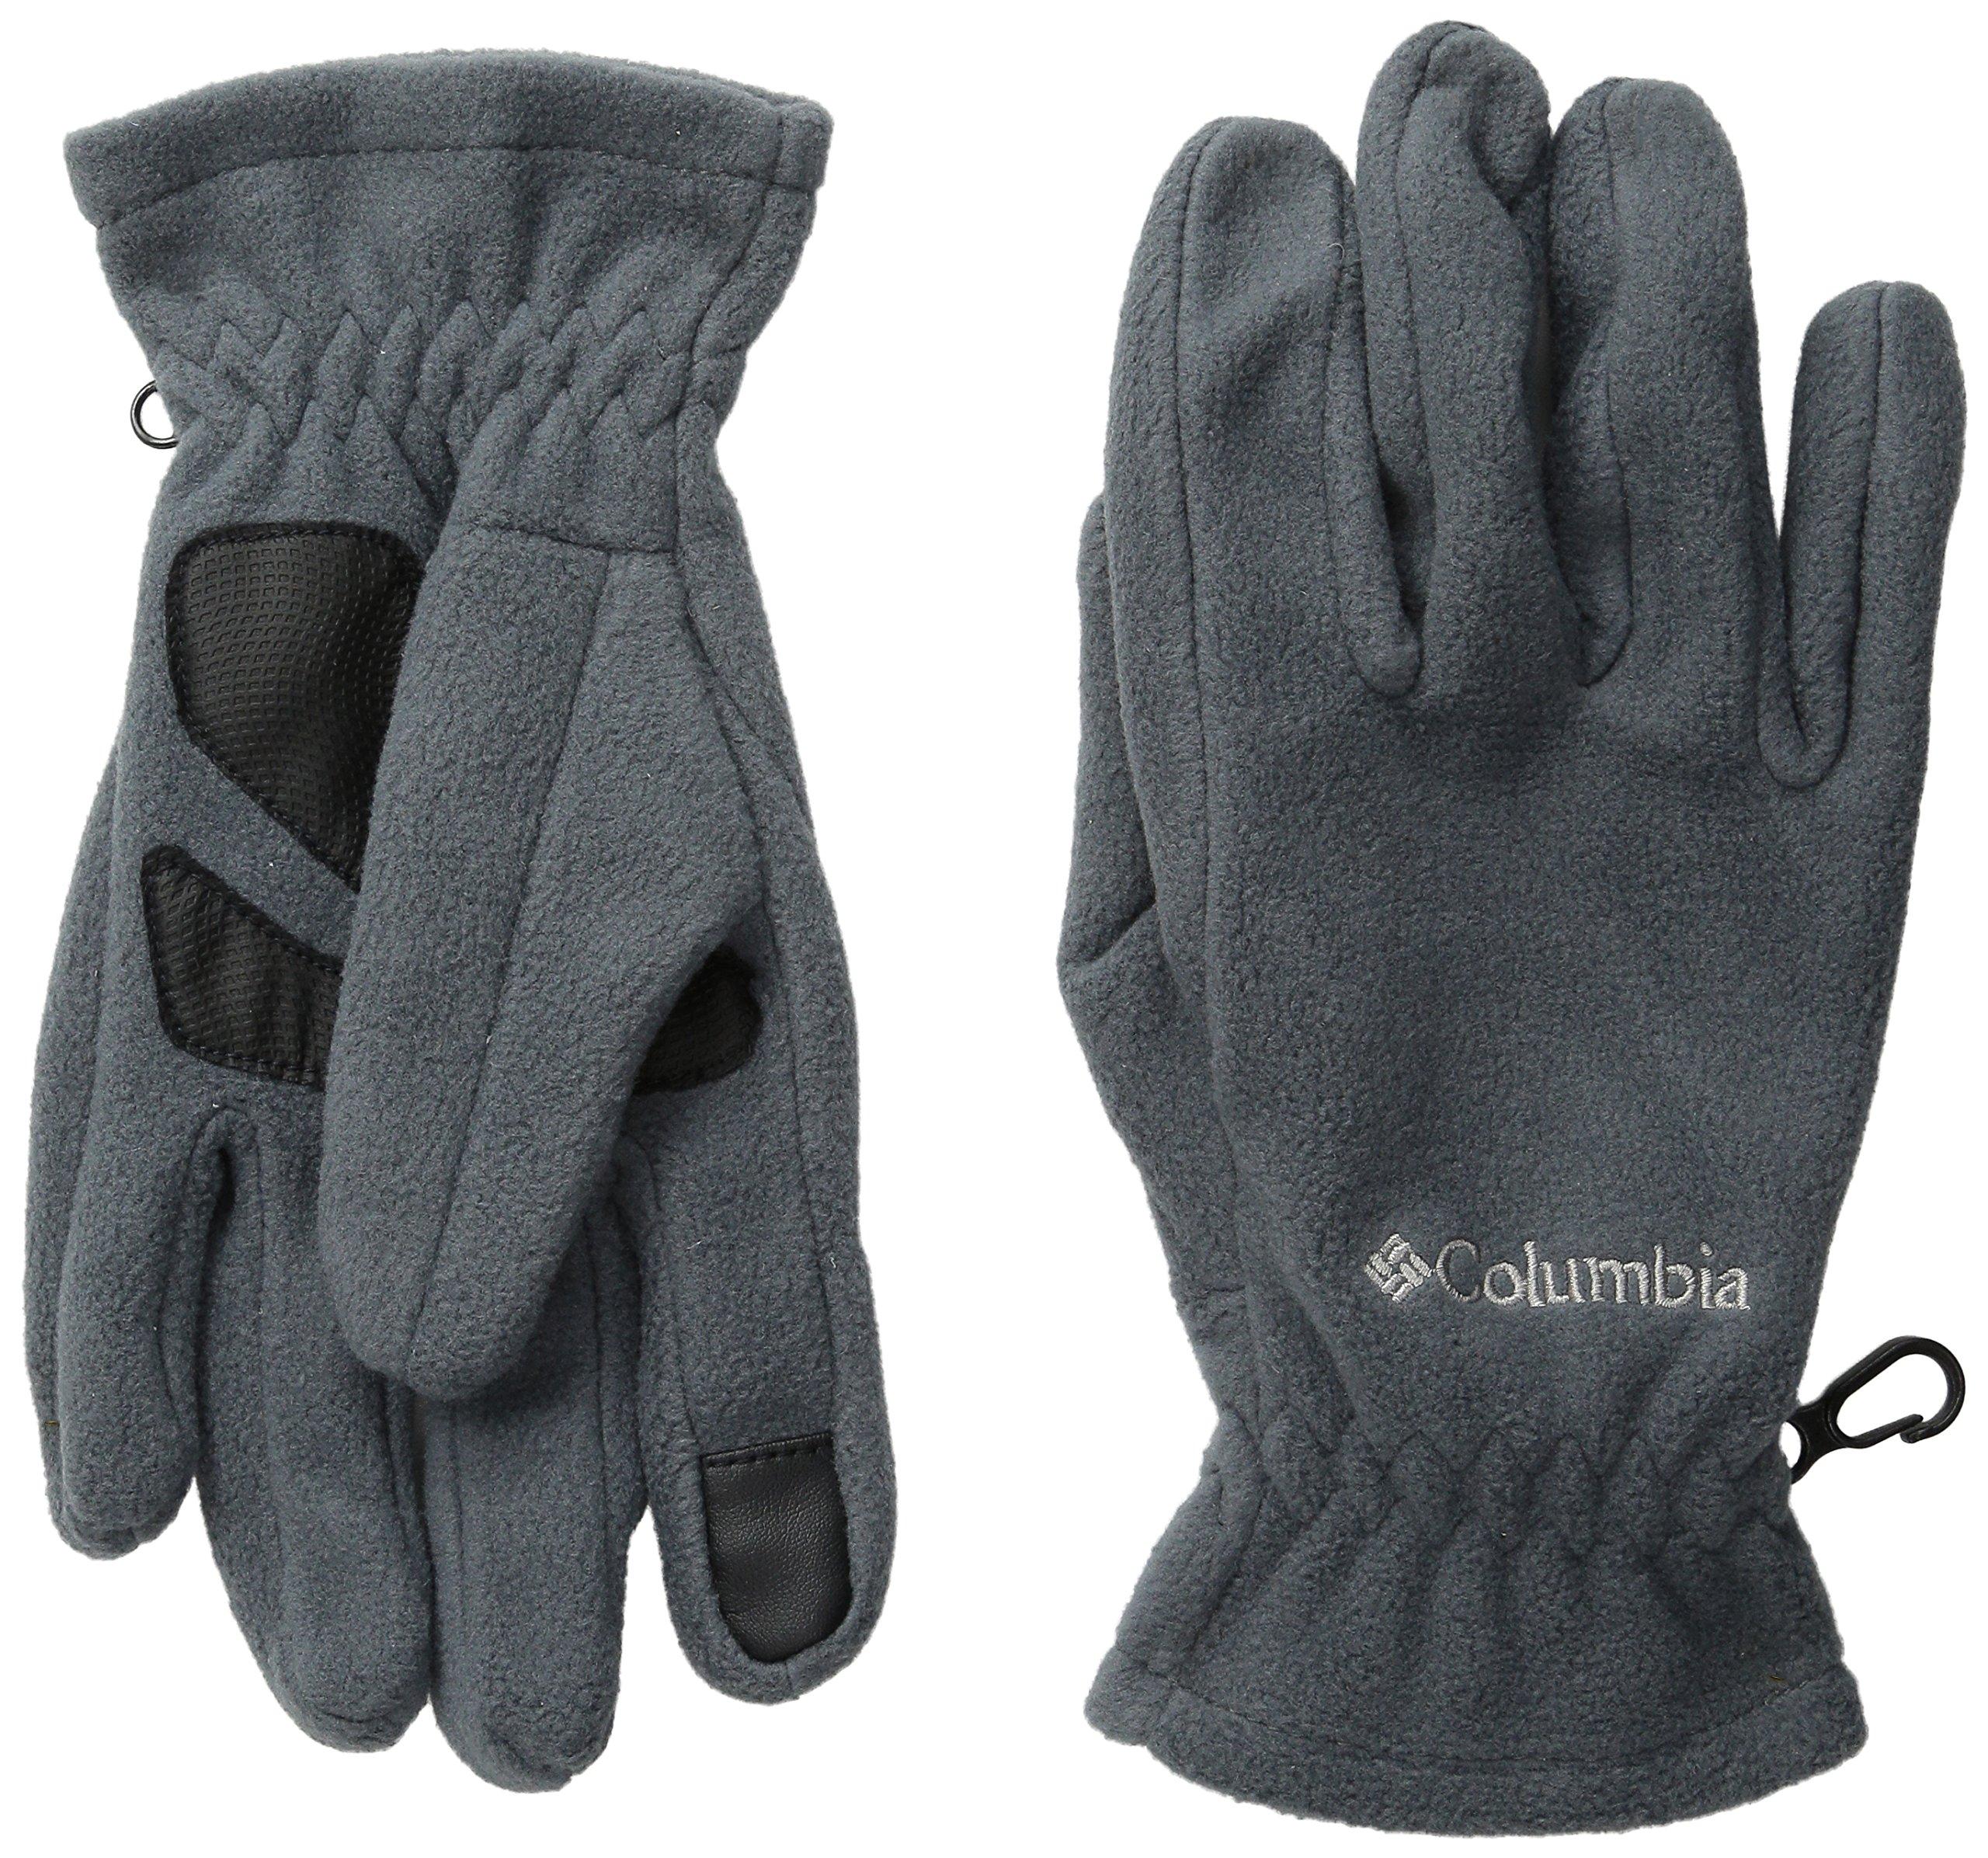 Columbia Women's Thermarator Glove, Graphite, Small